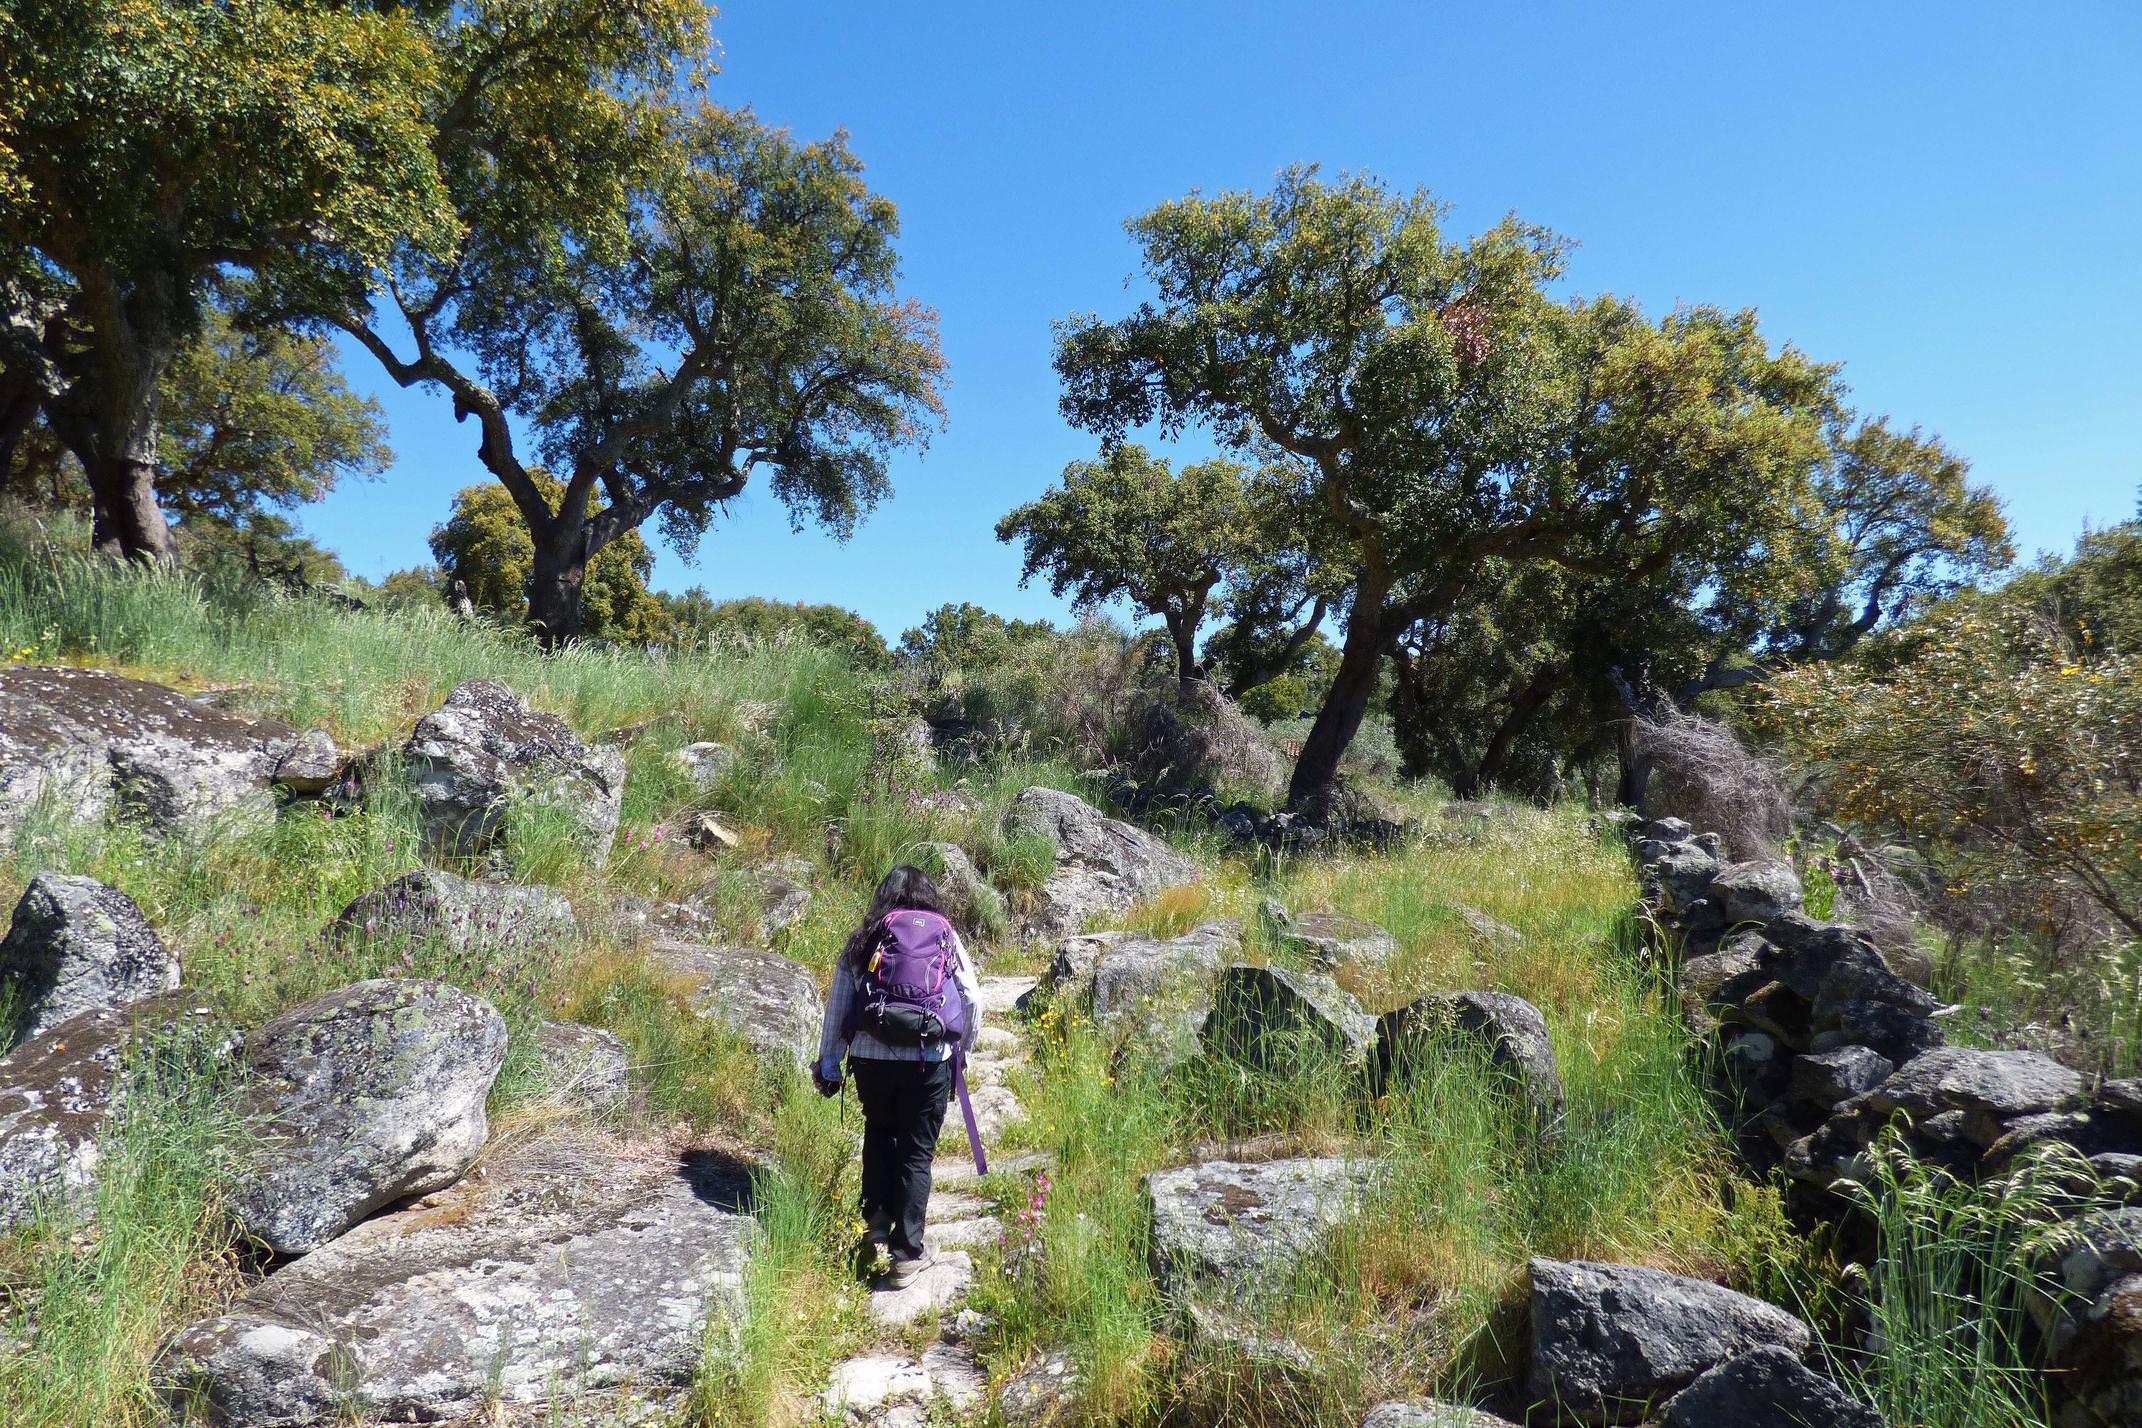 Portugal alentejo marvao hiking cork oaks sever riverl c diego pura